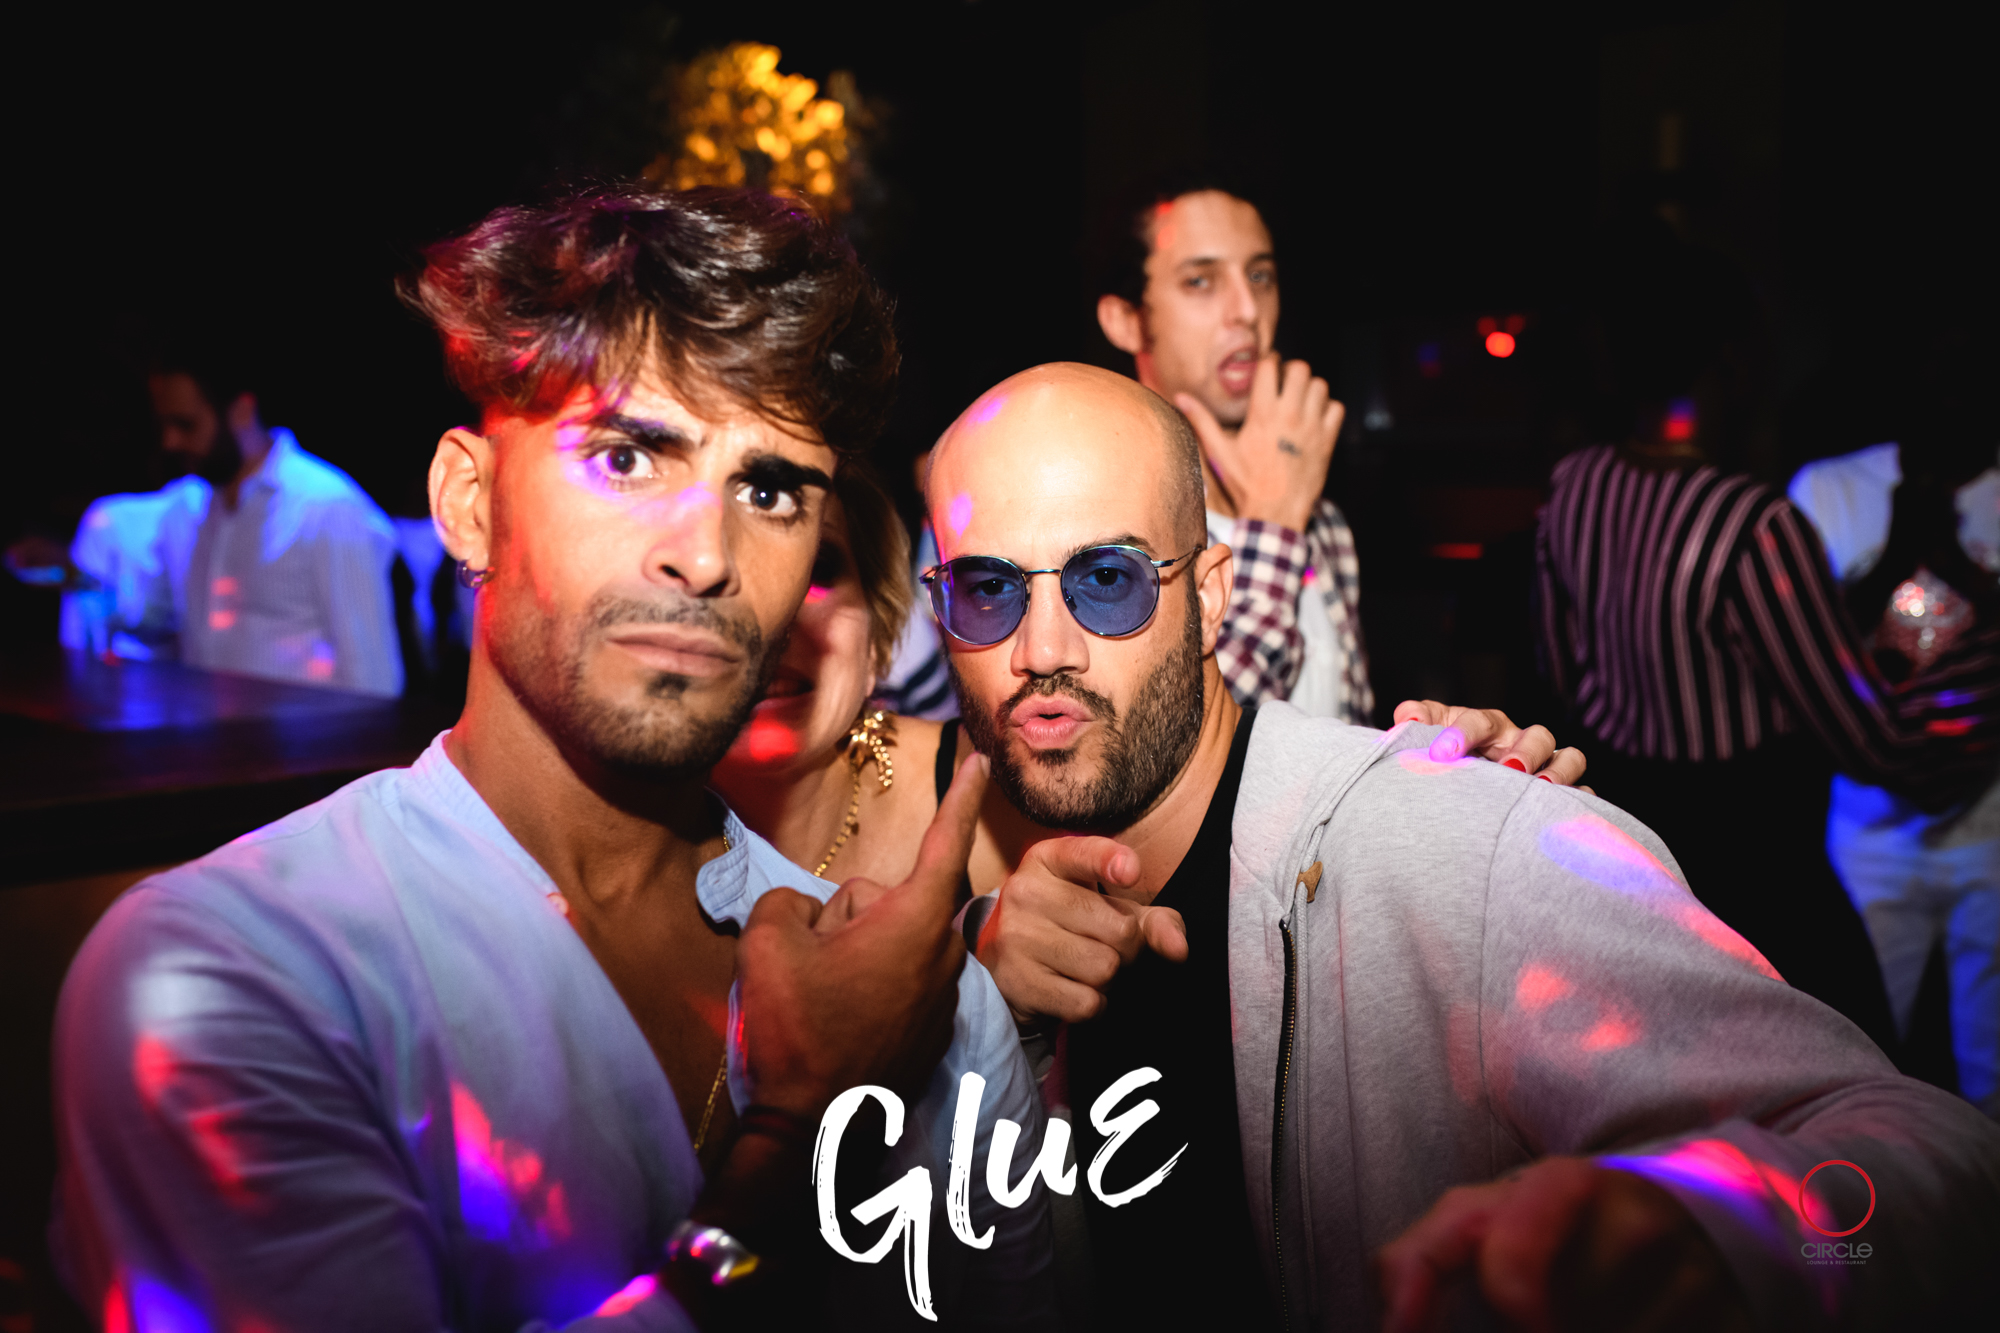 GLUE / Goodbye Summer | YOUparti circle milano friday free club house disco music